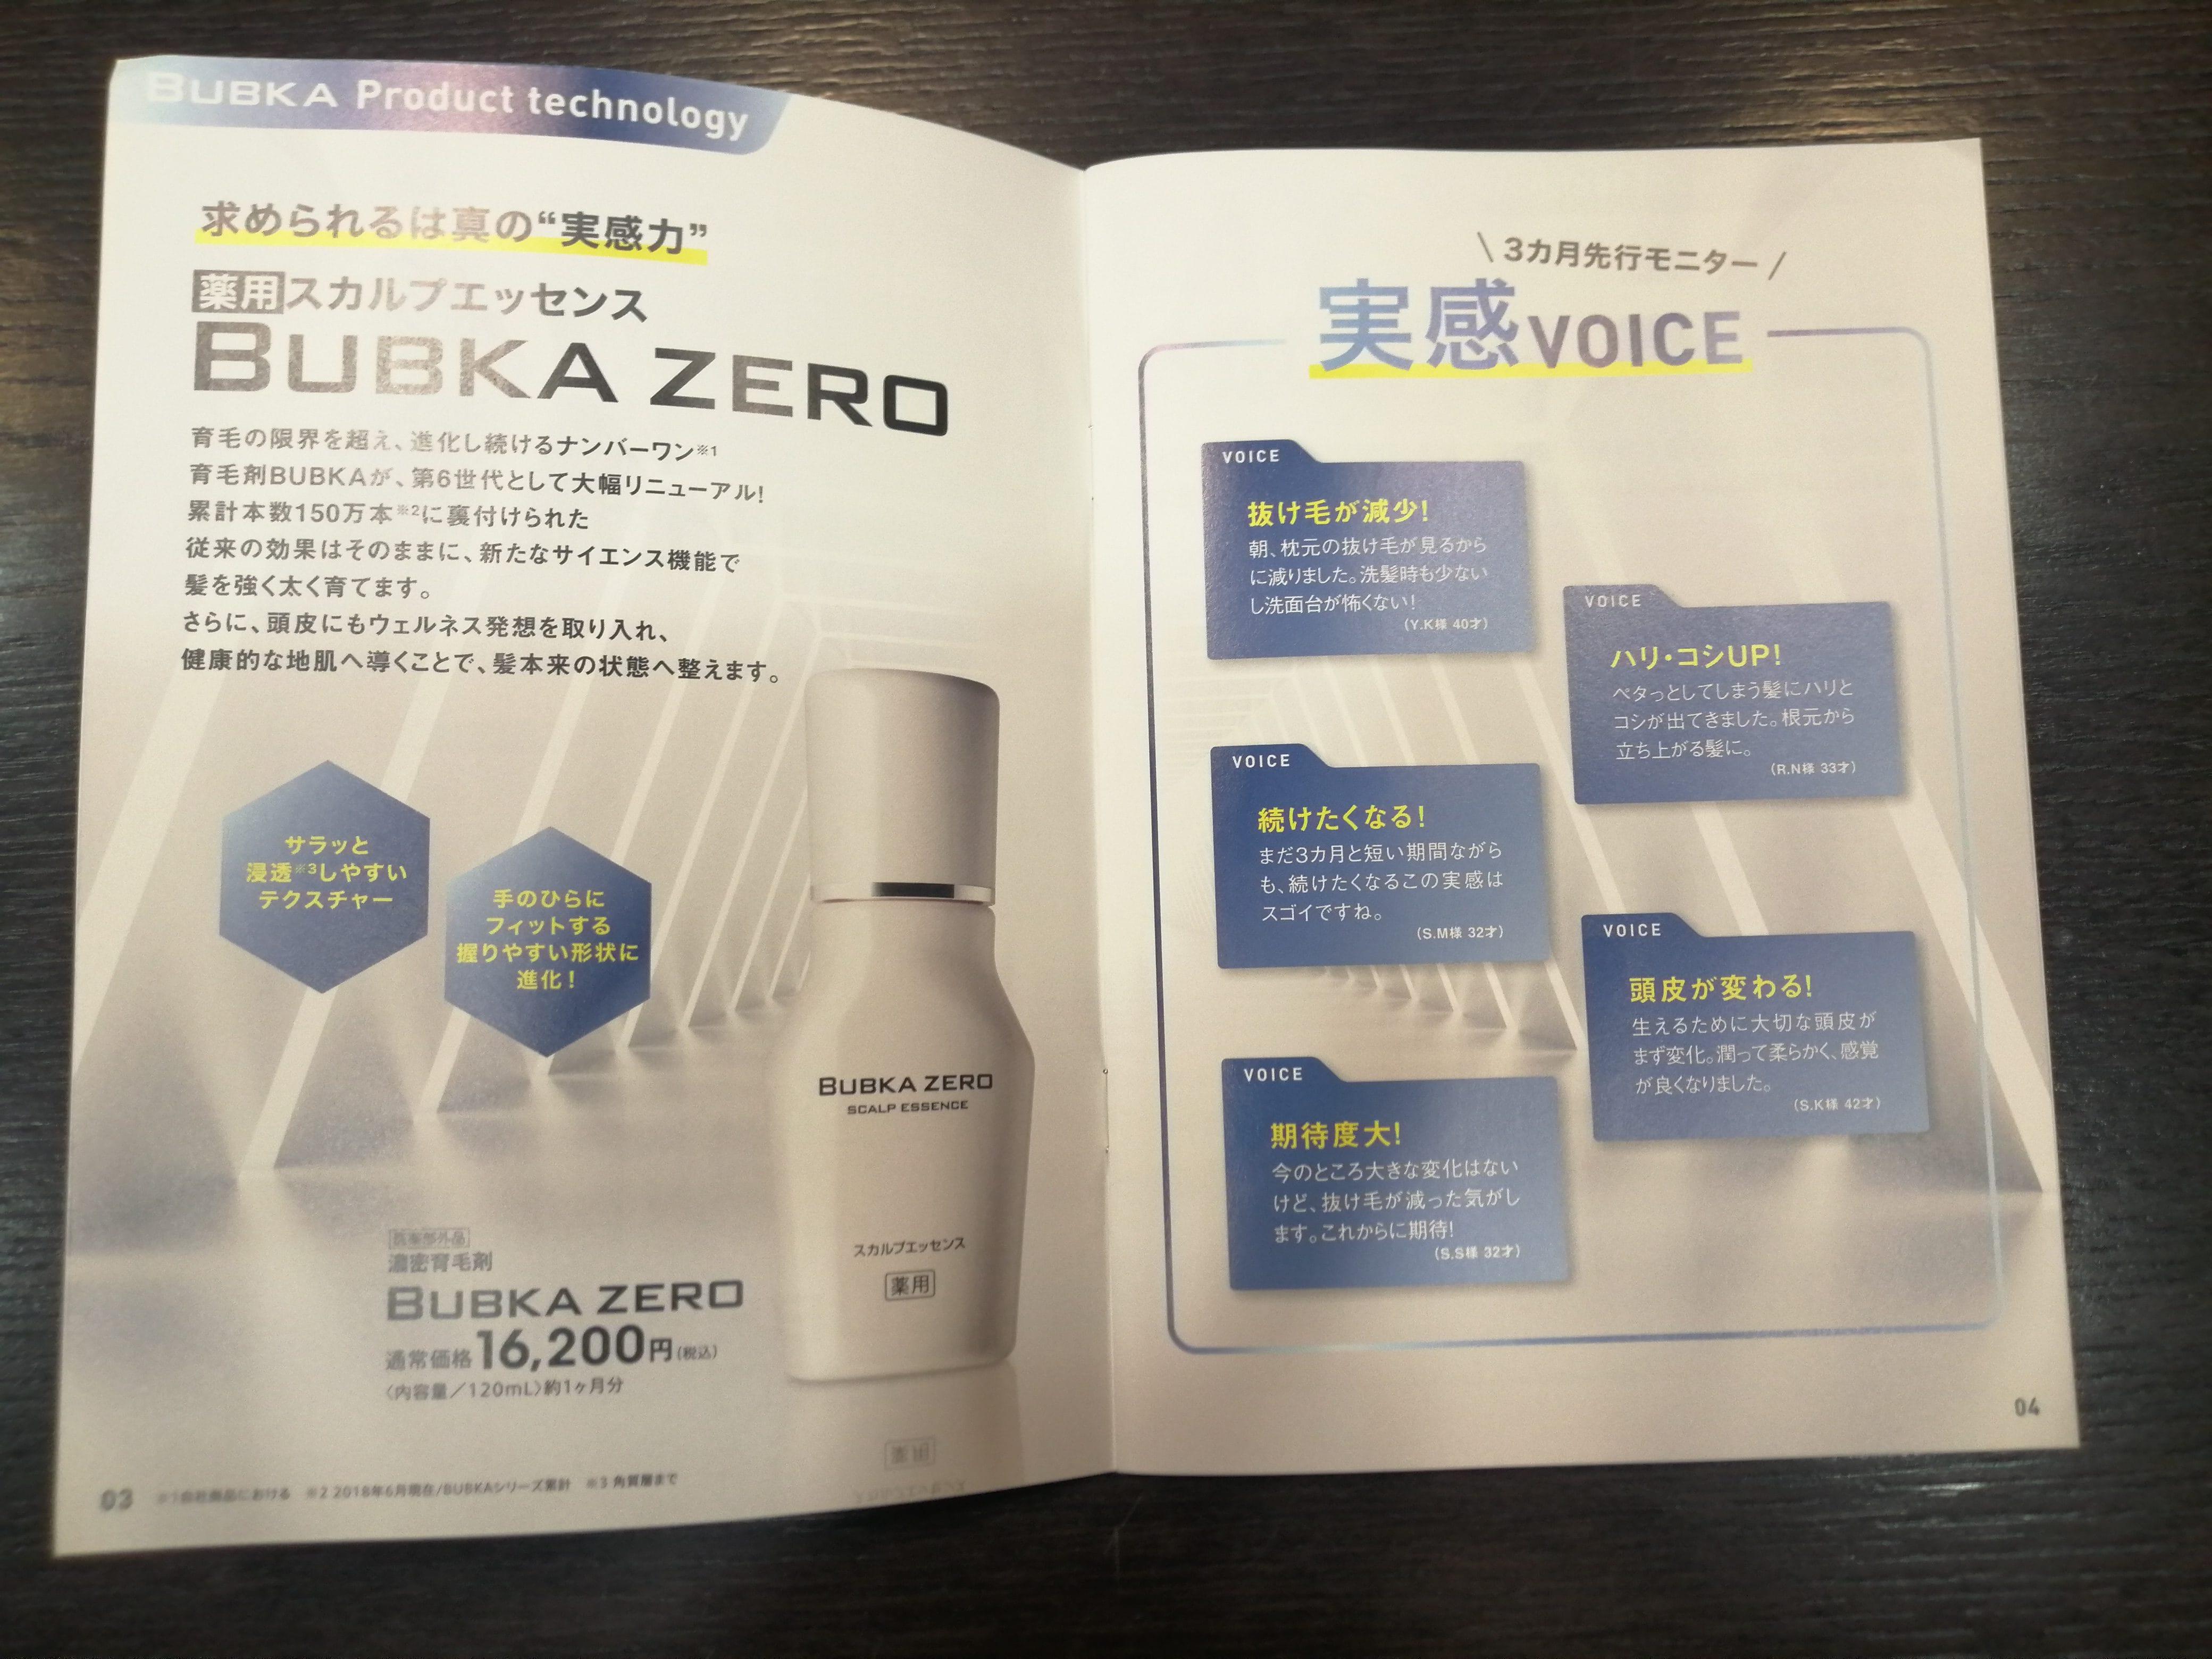 BUBKA ZEROの特徴やモニターの声が記載されているチラシ